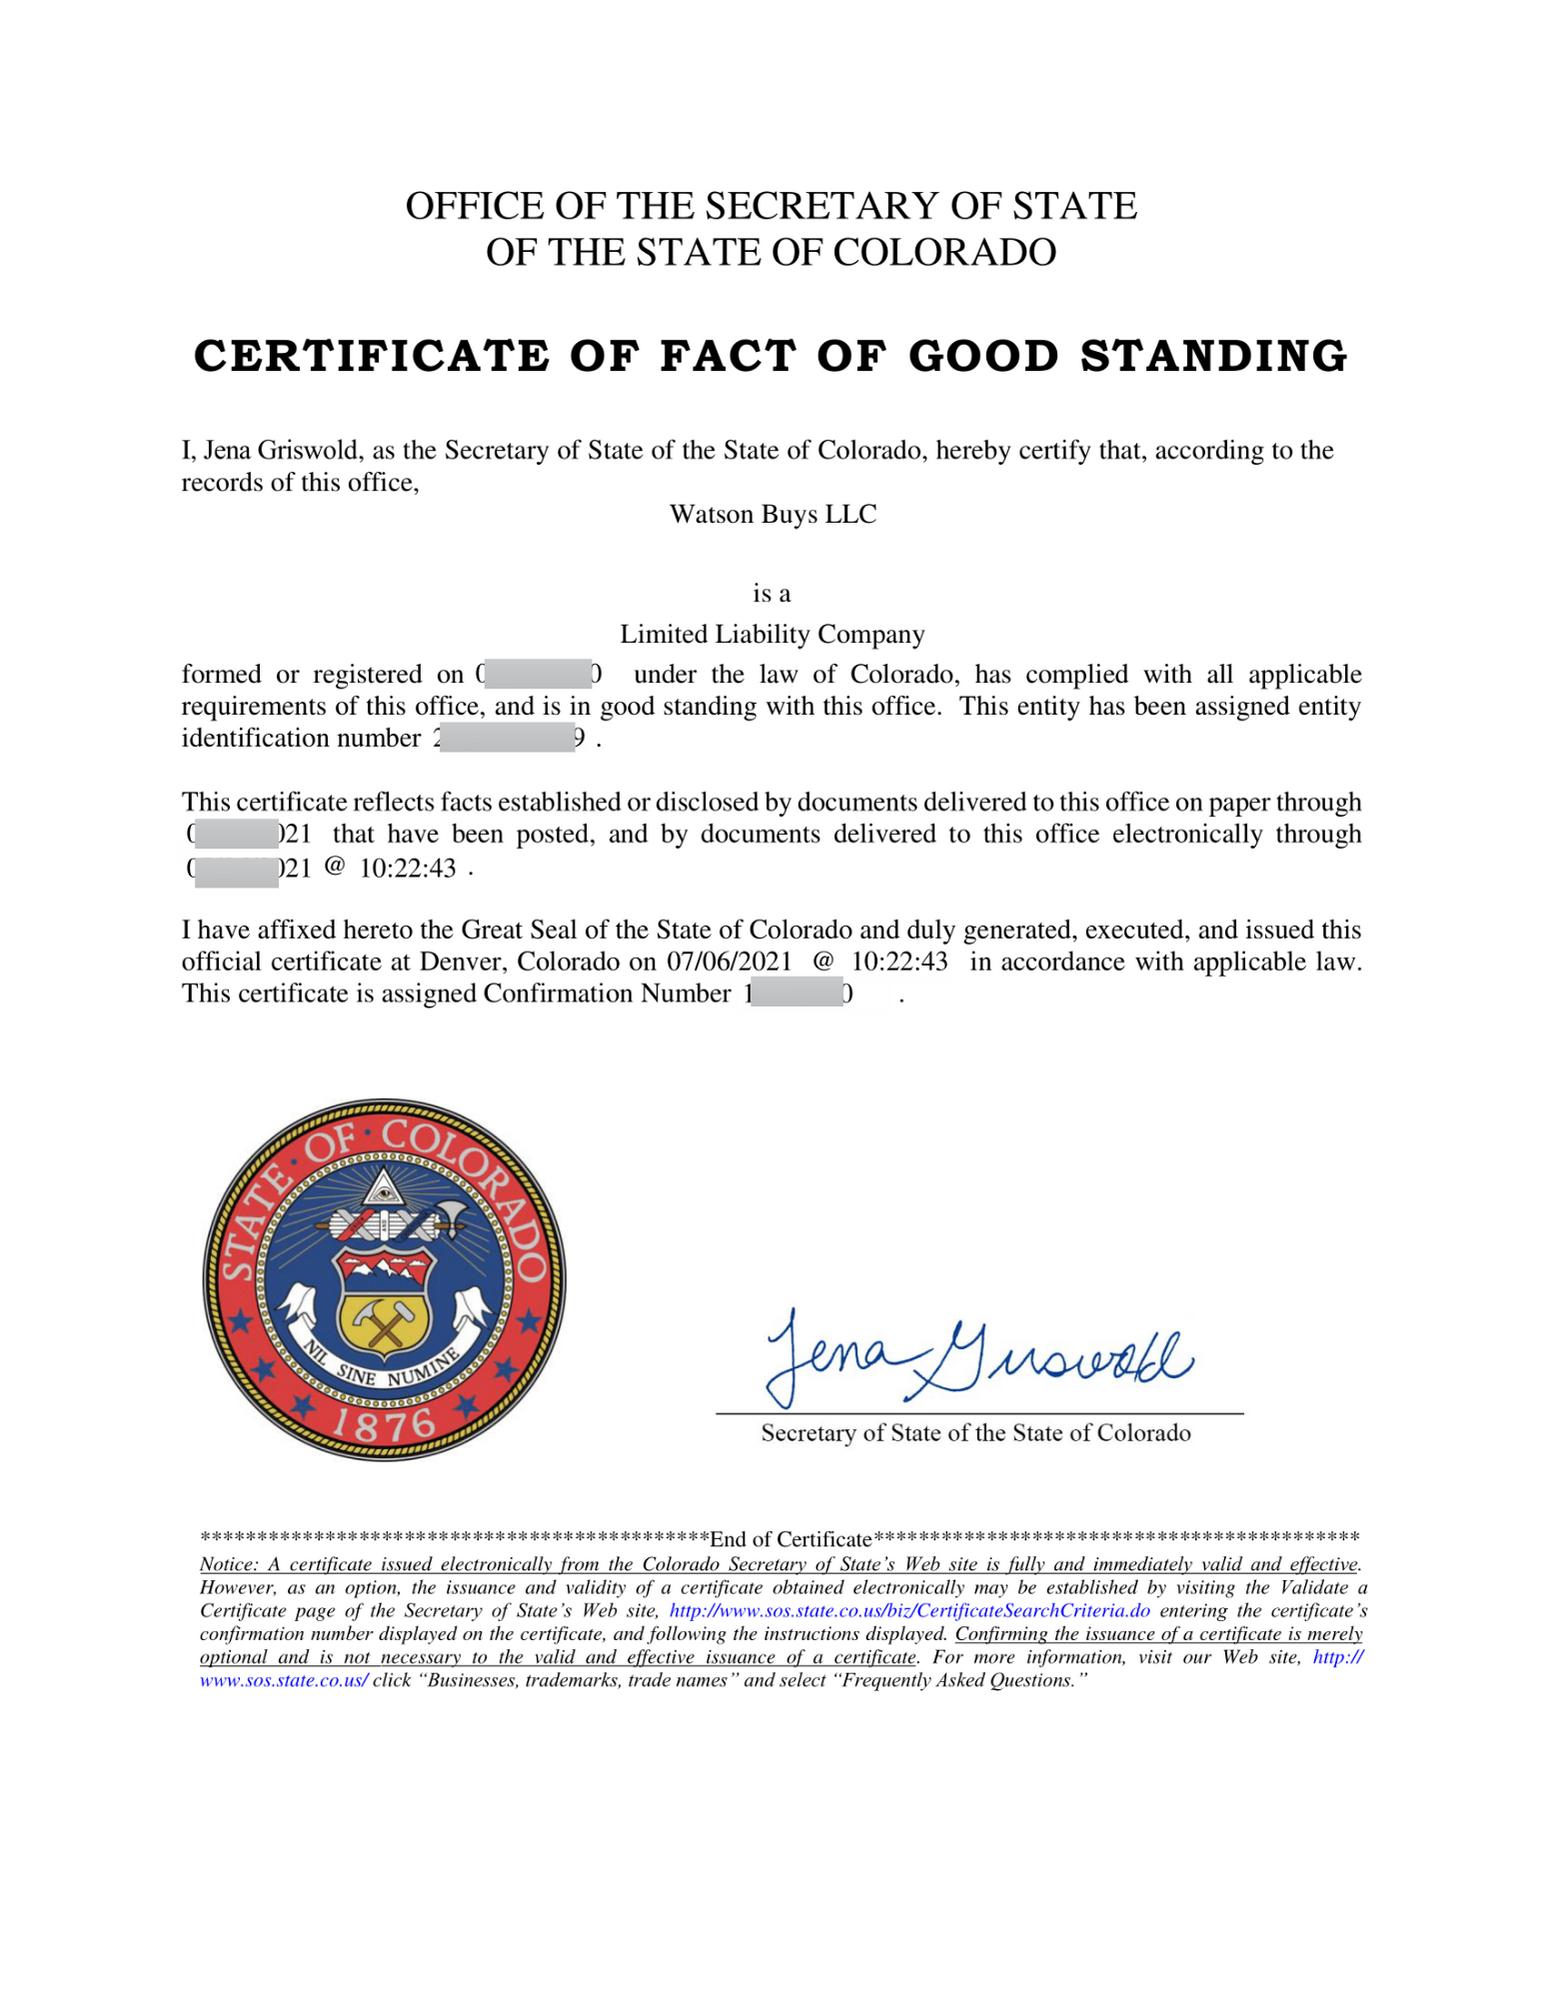 Certificate-of-Good-Standing-Watson-Buys